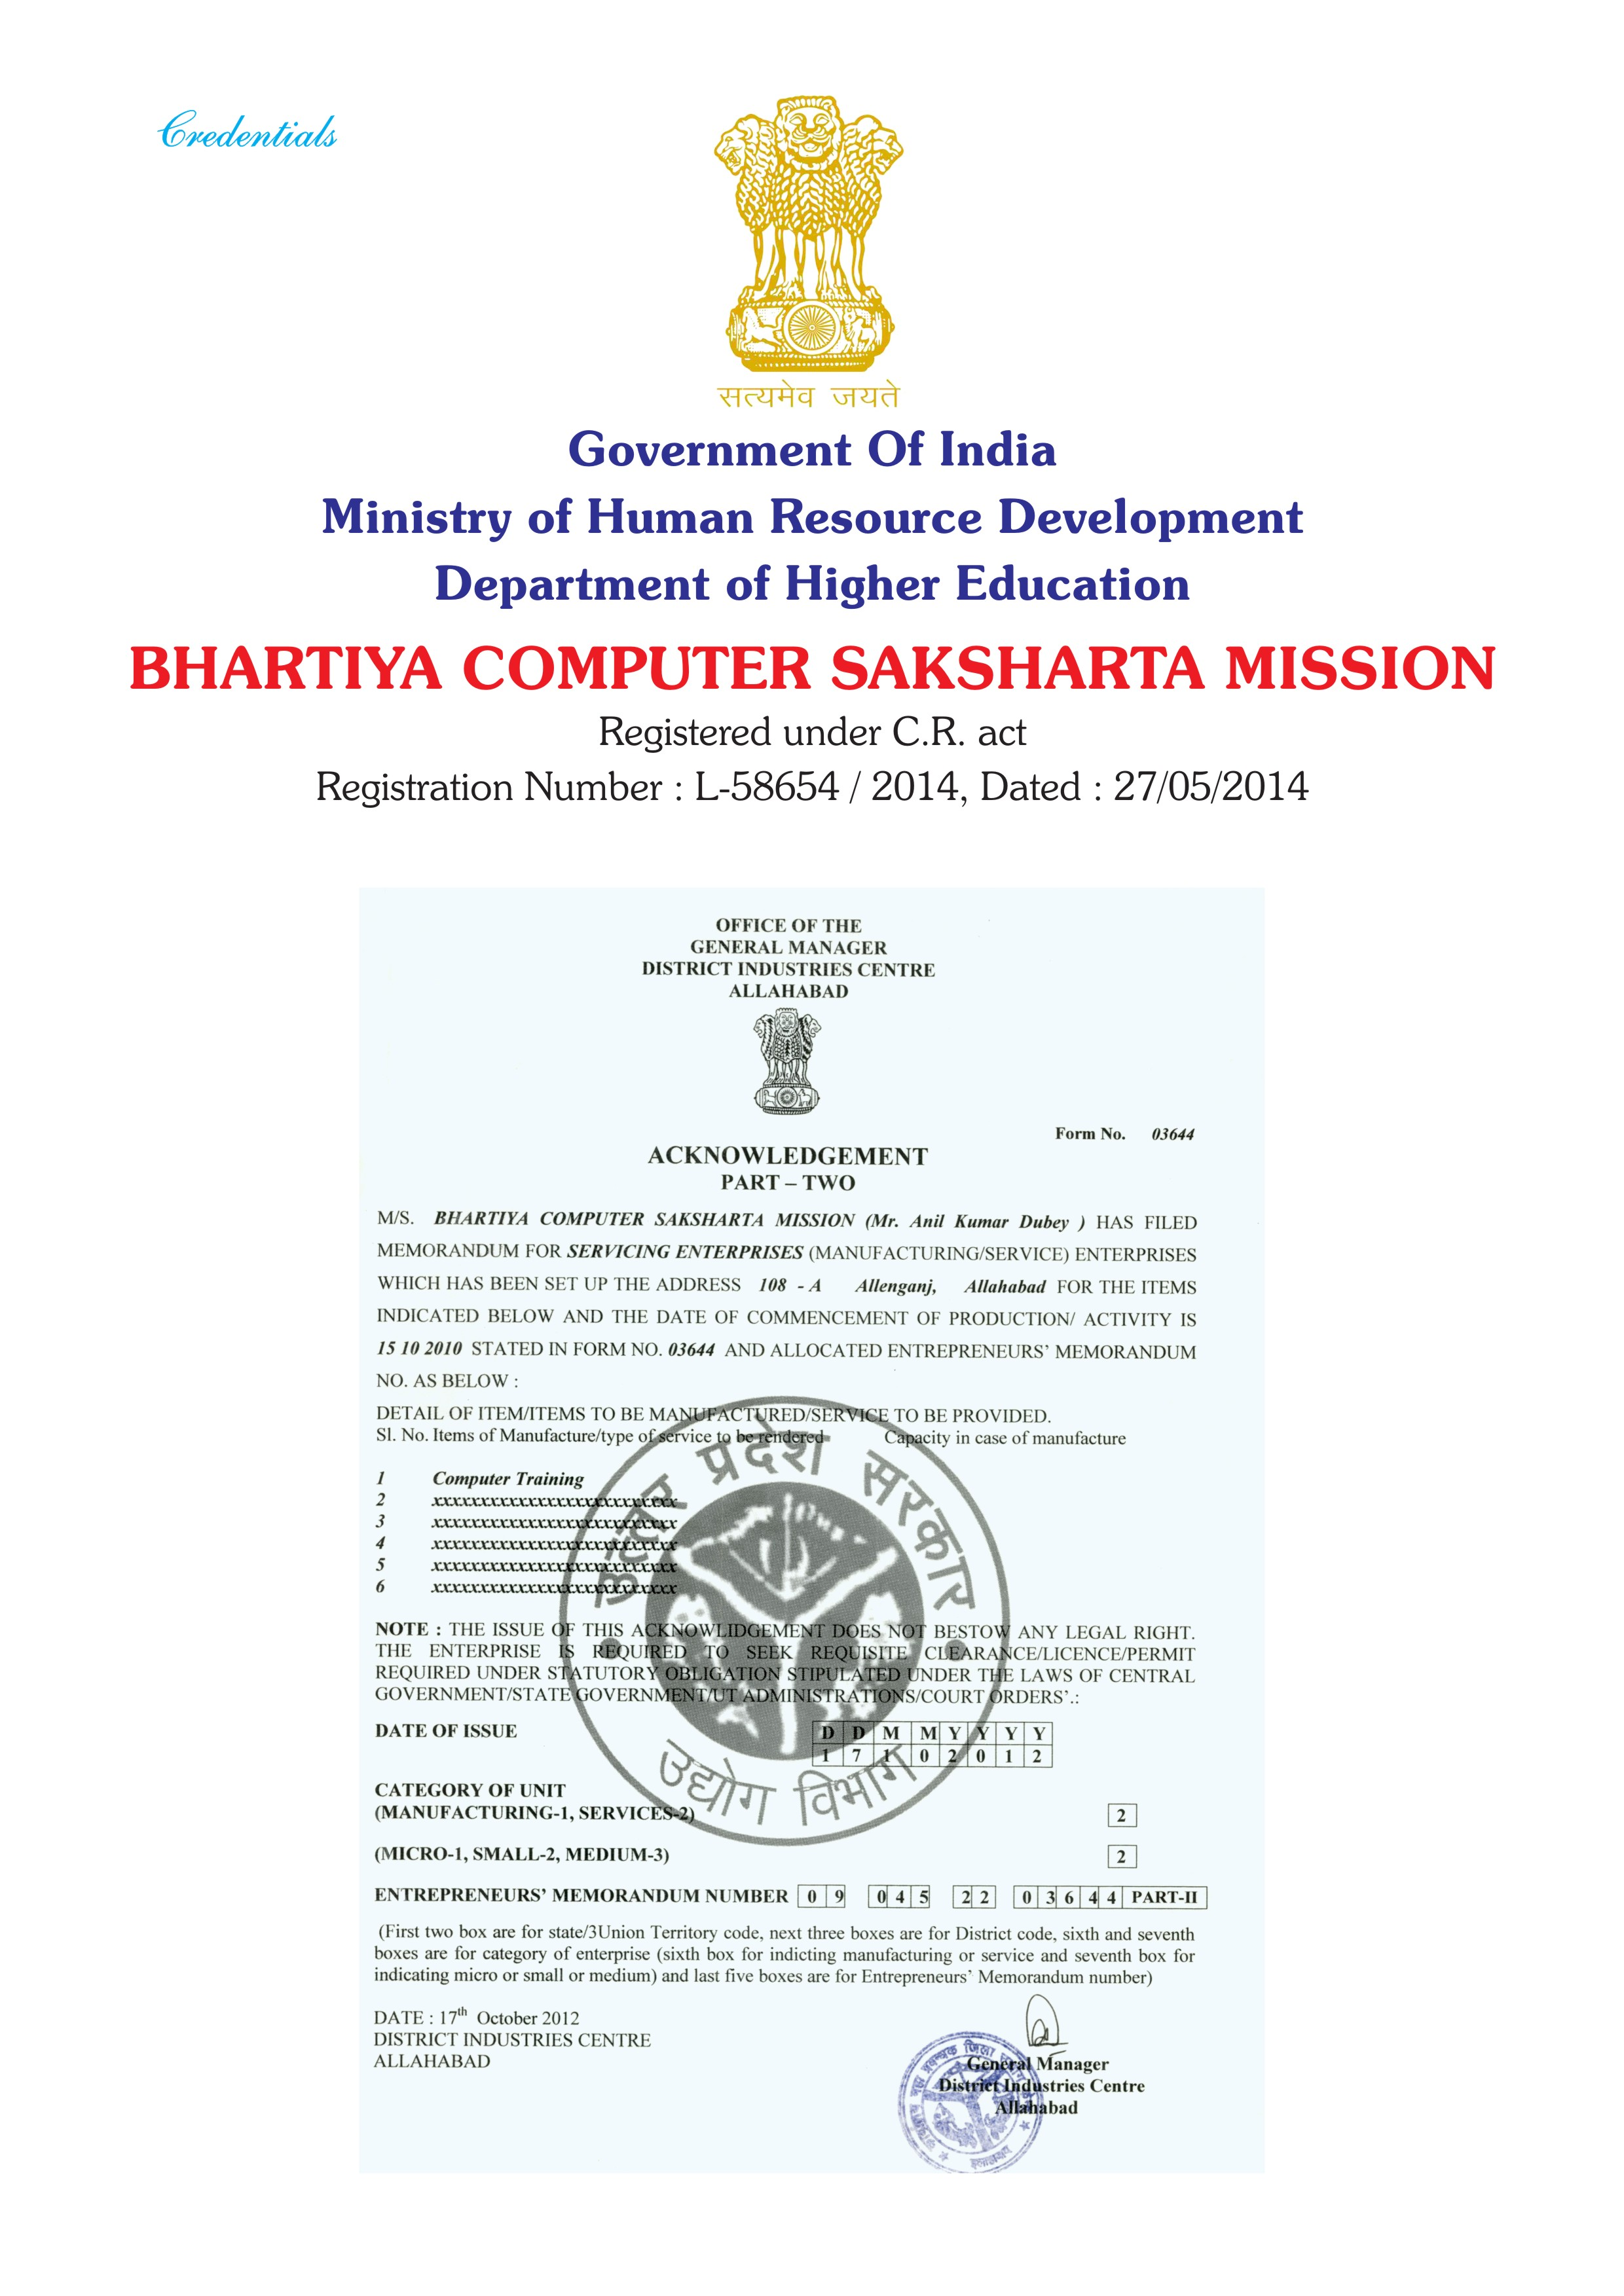 Bcsm bhartiya computer saksharta mission iso 90012008 1betcityfo Image collections